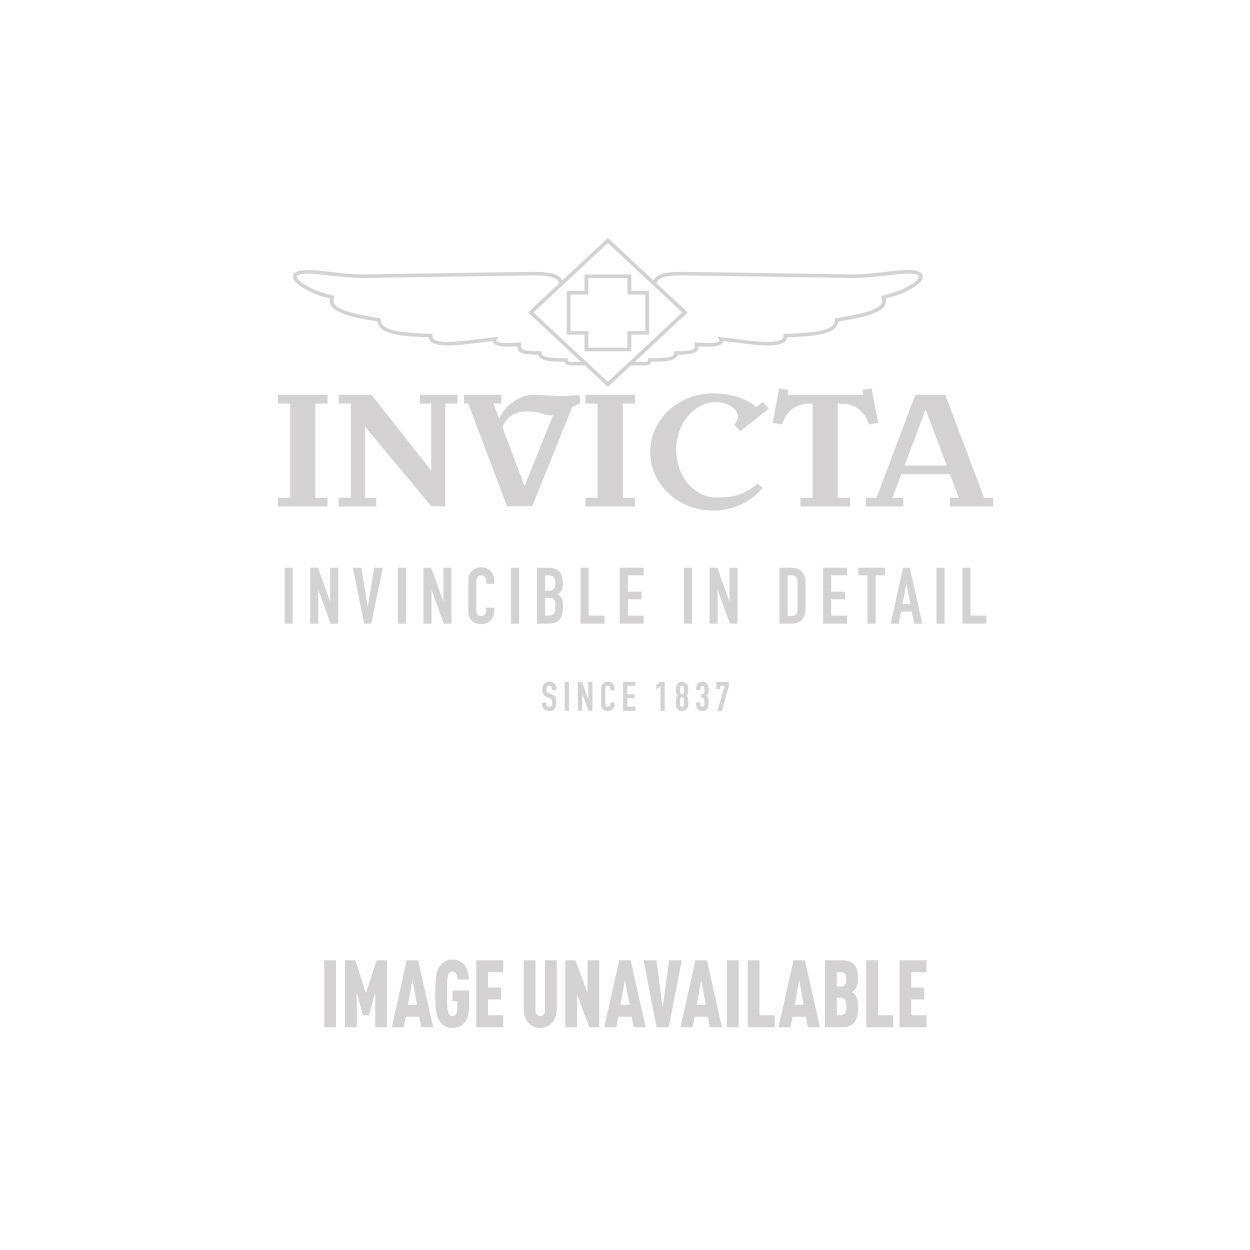 Invicta Coalition Forces Swiss Made Quartz Watch - Titanium, Sandblast case with Steel, Titanium tone  band - Model 10019